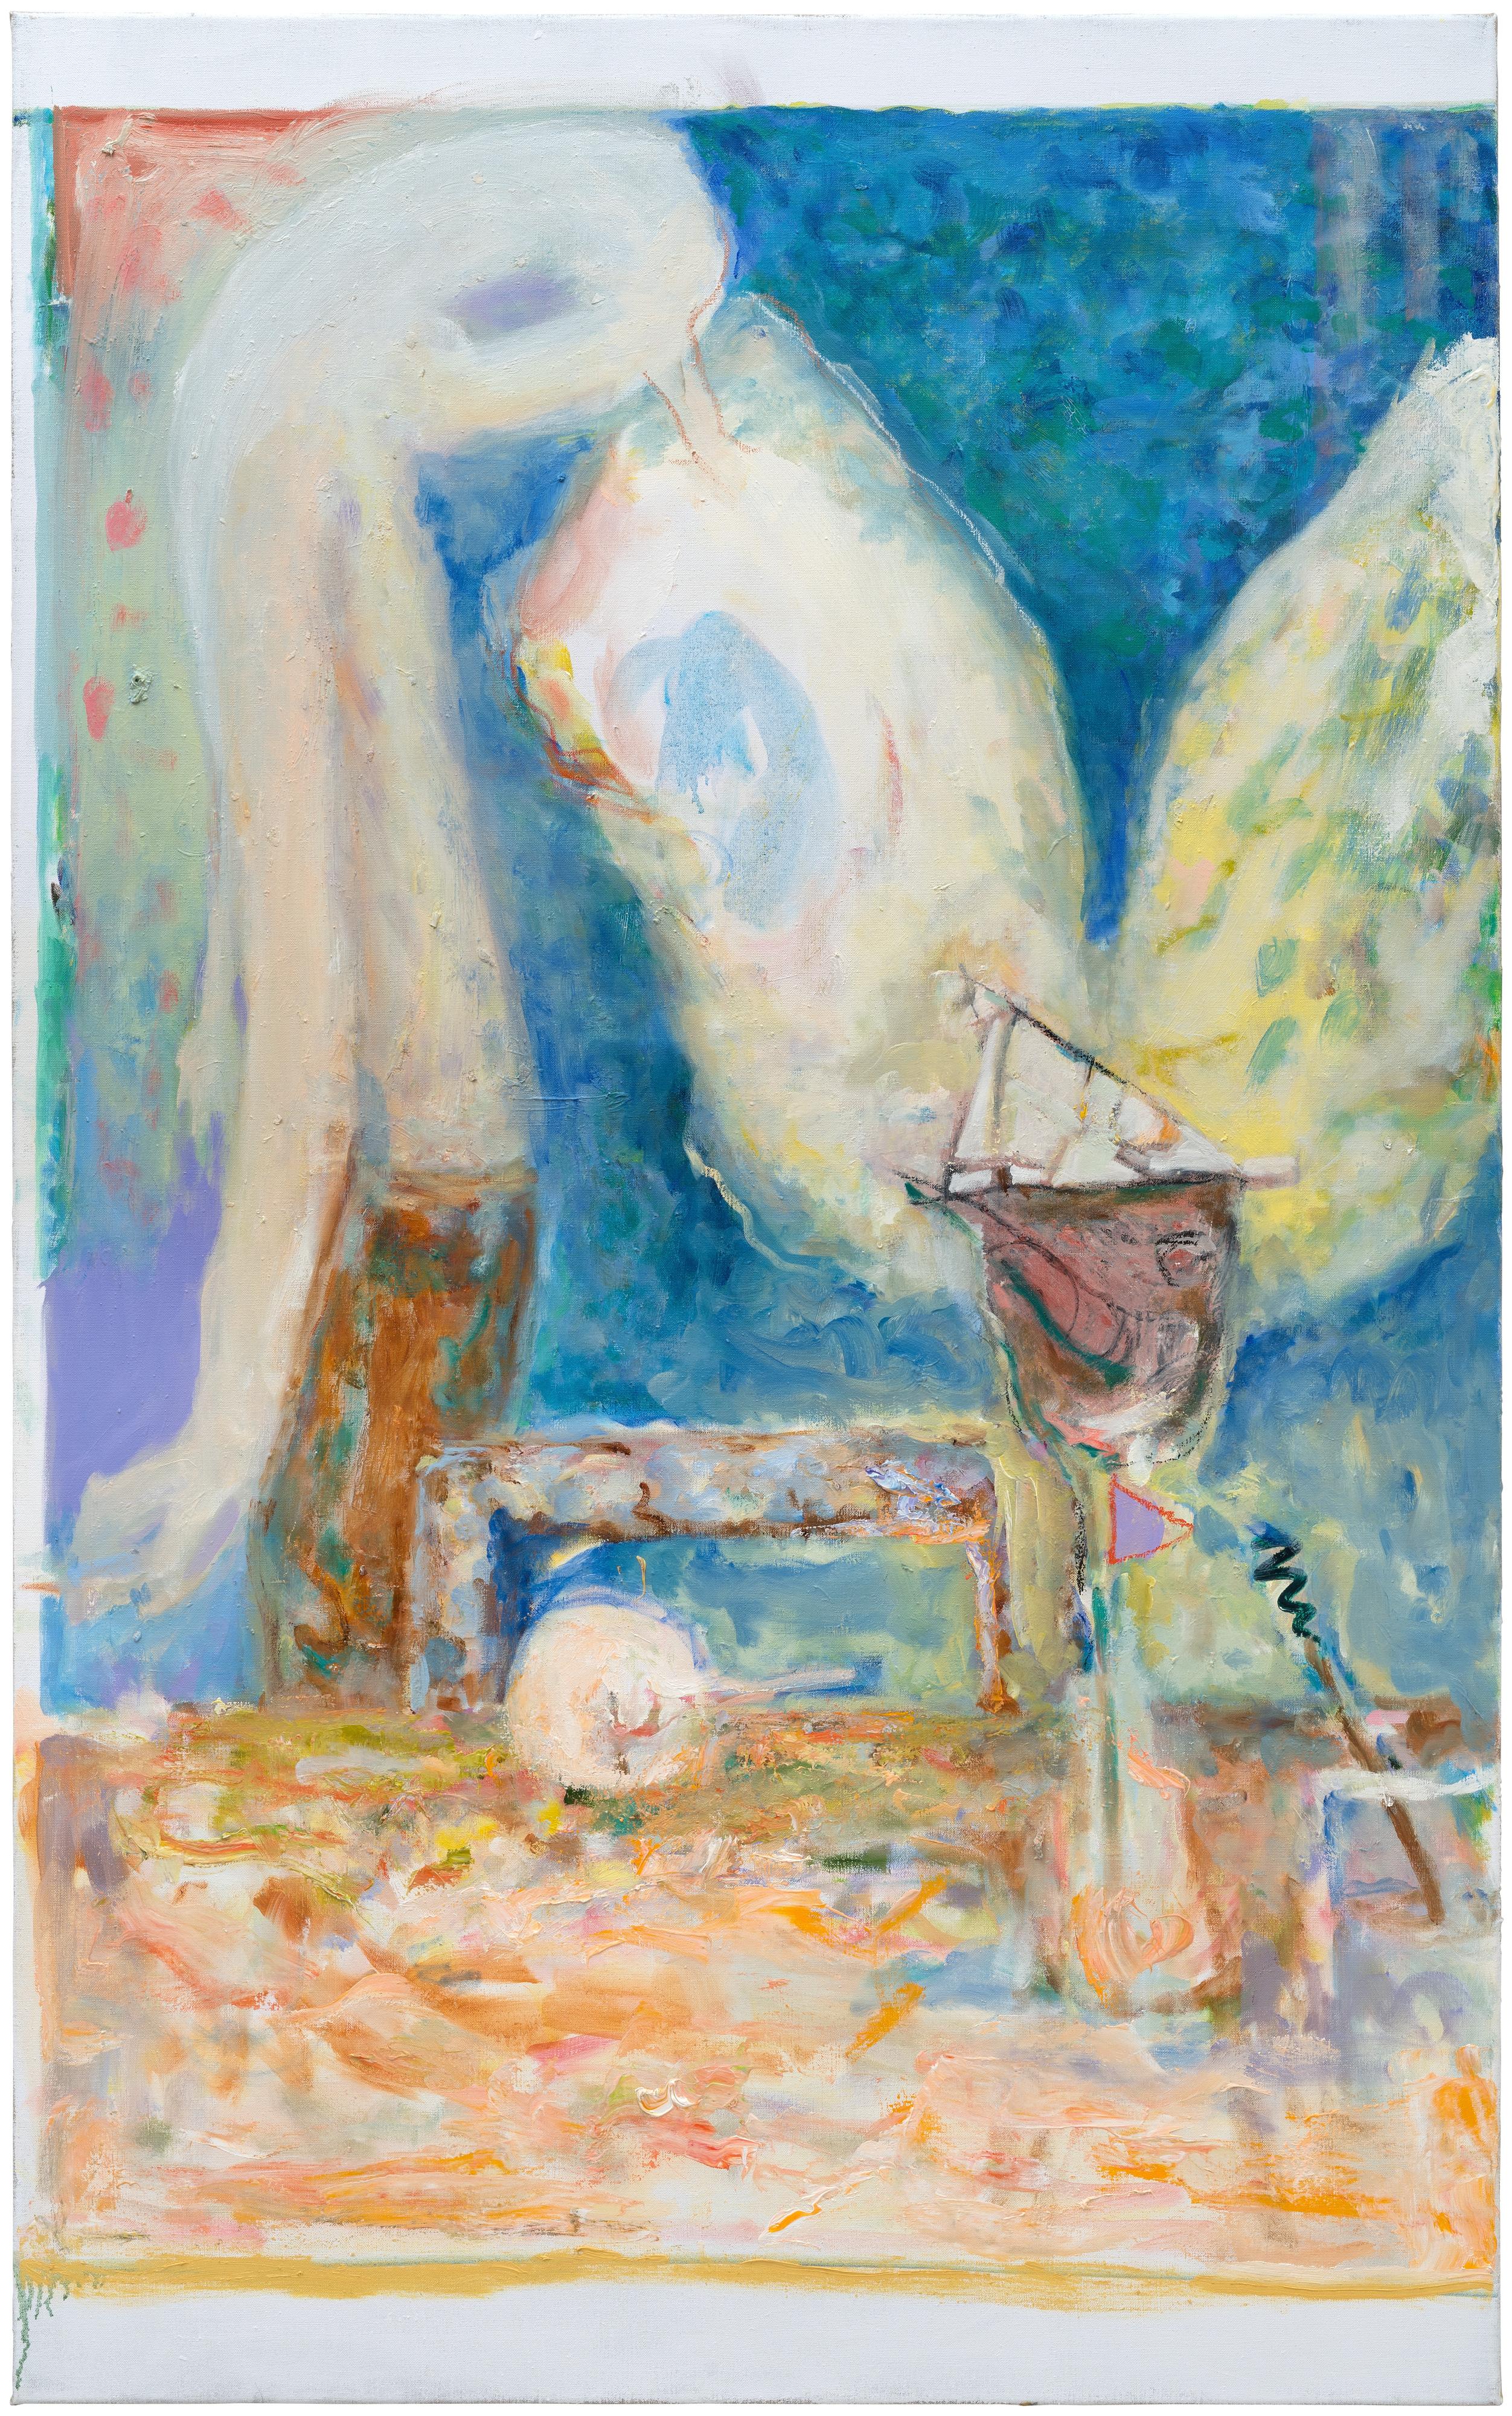 Galerie Barbara Thumm \ Valérie Favre: Am Tisch (VFa-18-014) \ Oil on canvas (2018)